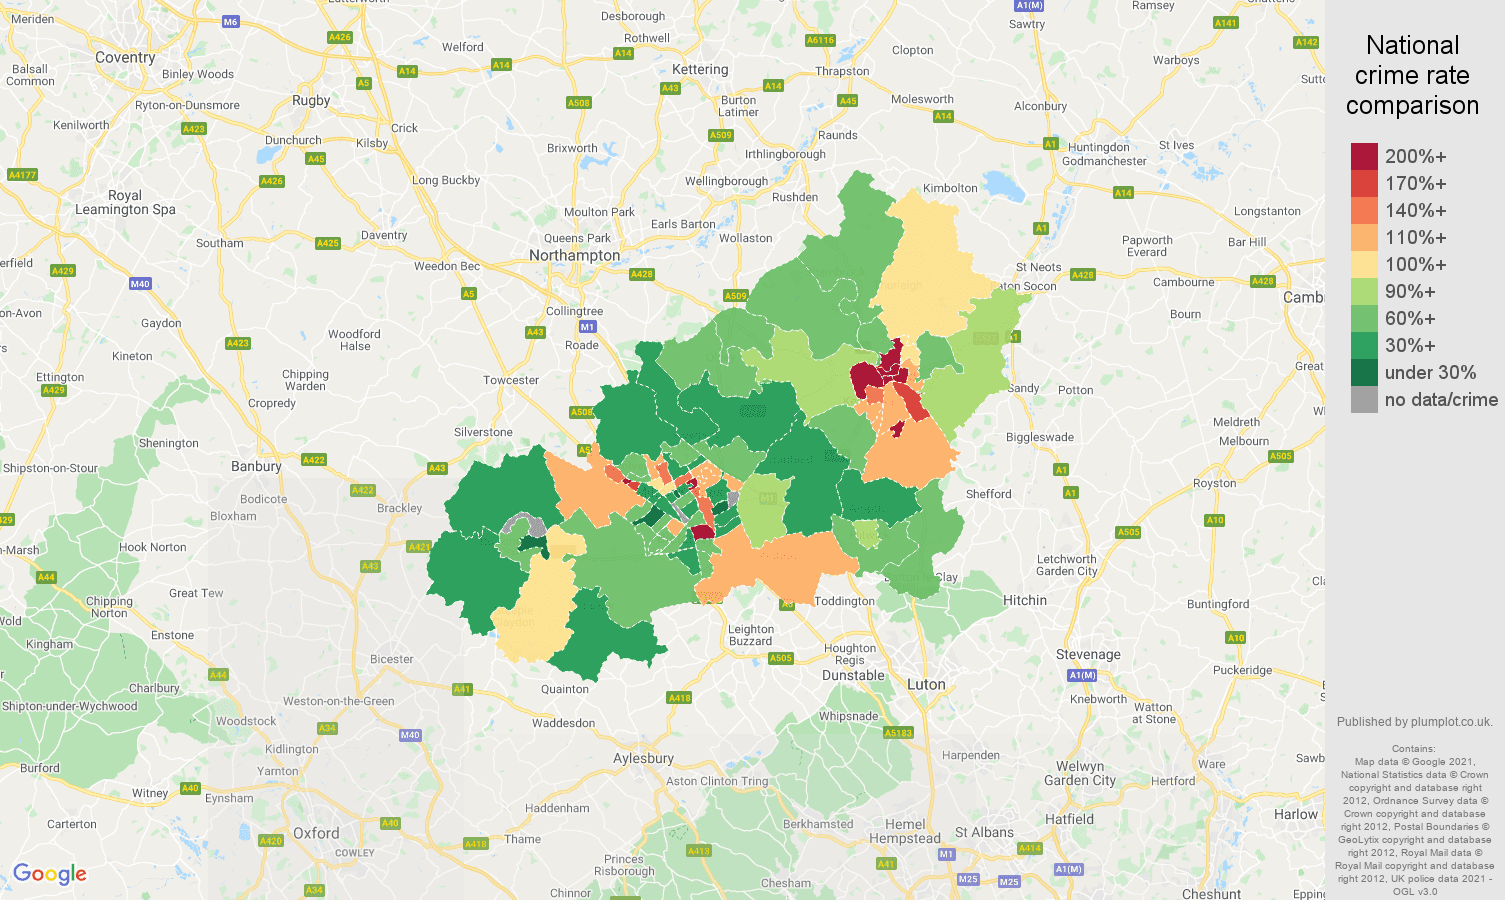 Milton Keynes burglary crime rate comparison map